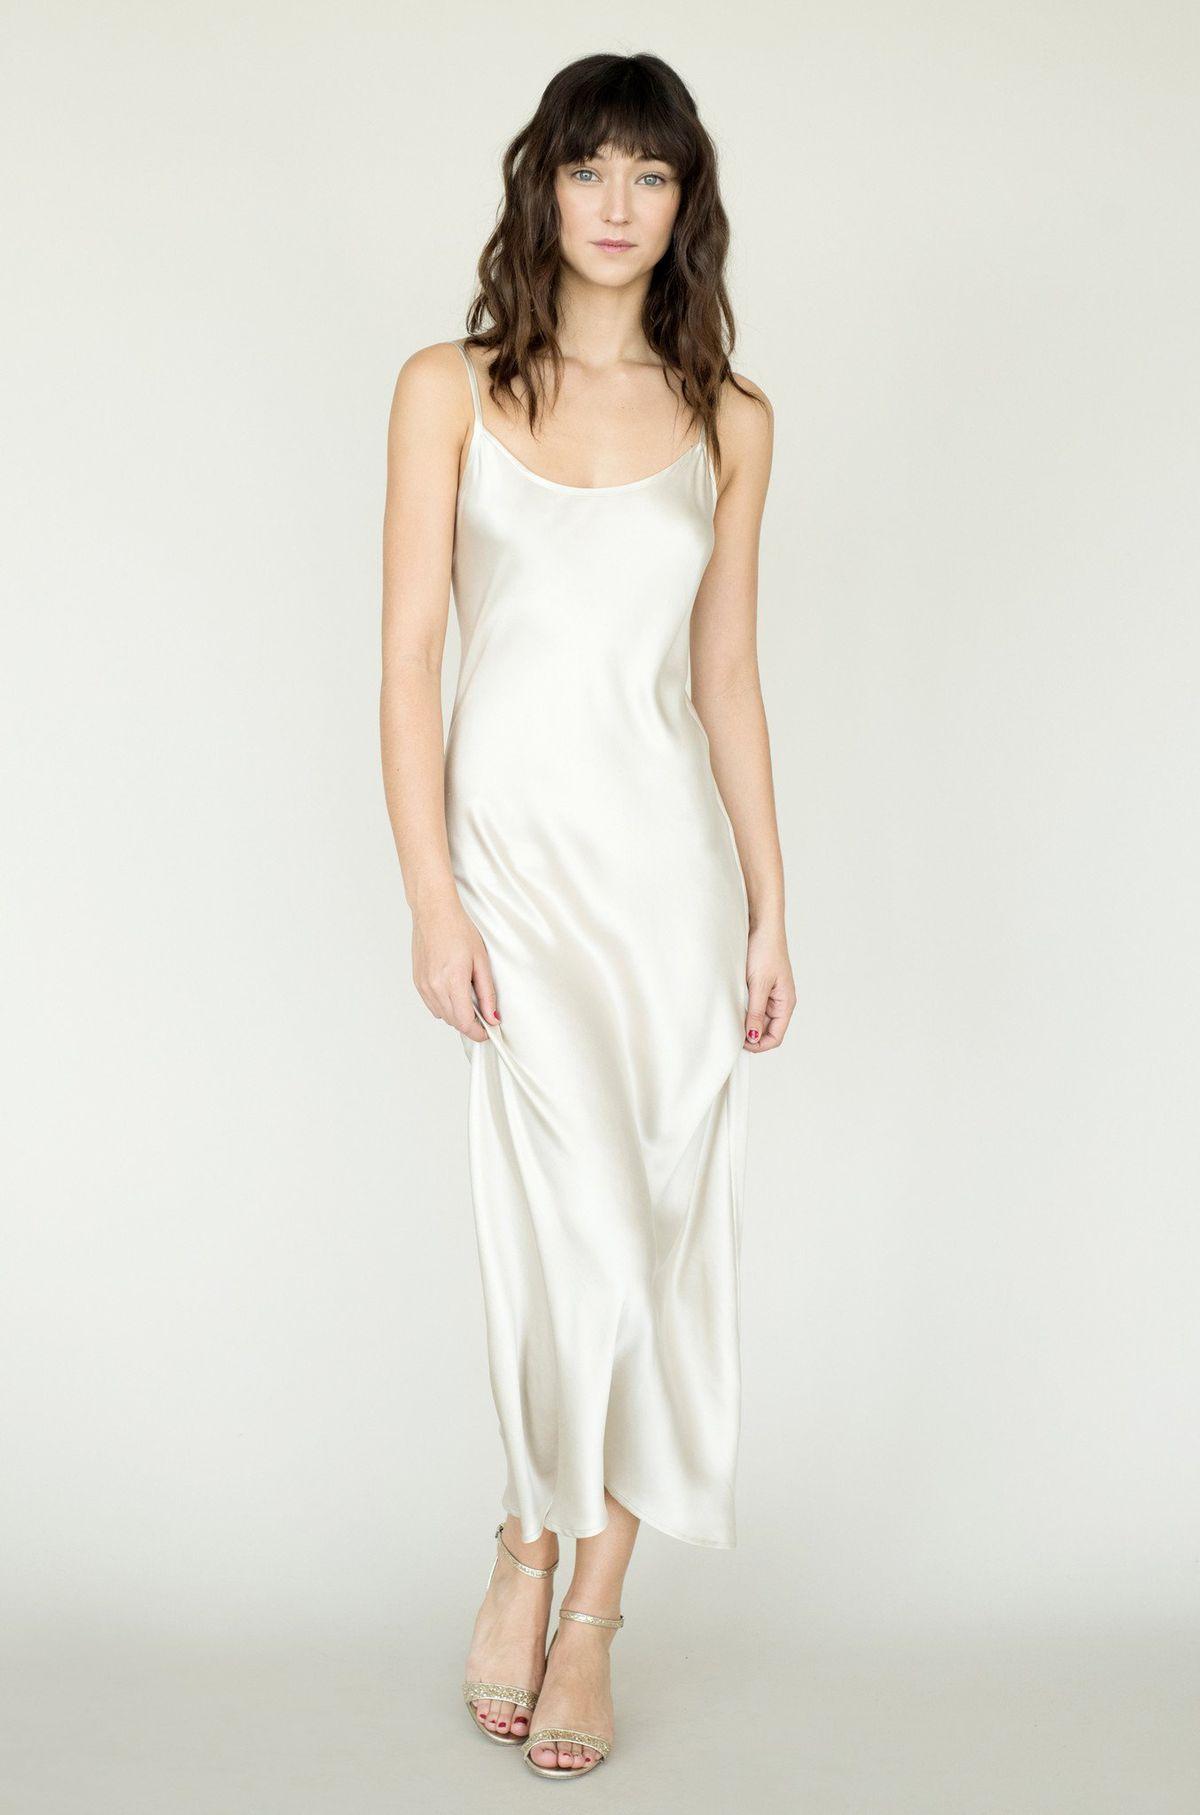 A model wearing a white slip dress